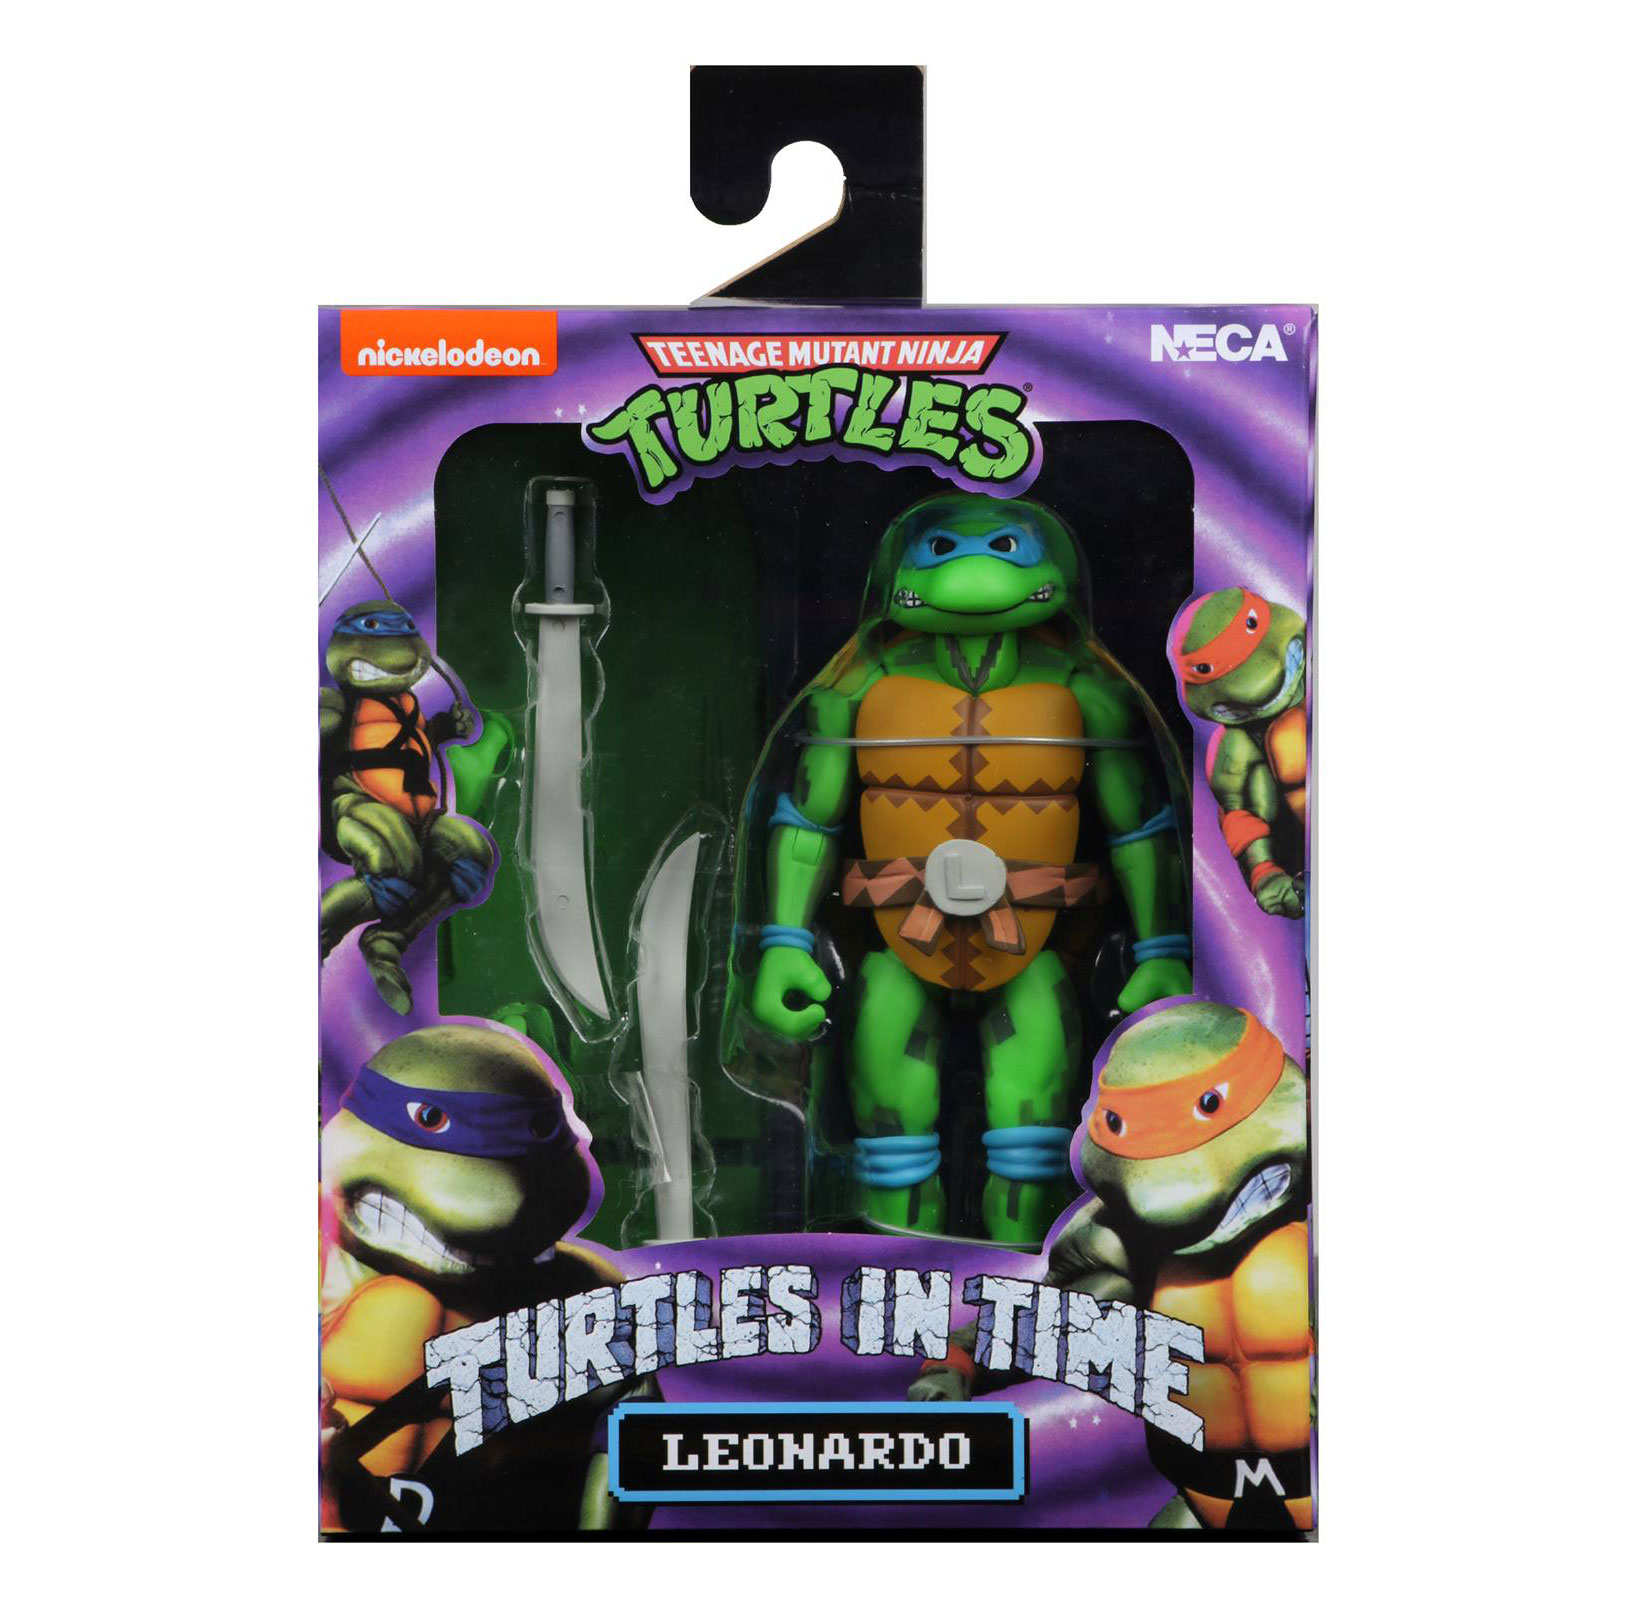 NECA-Turtles-In-Time-Leonardo-packaging